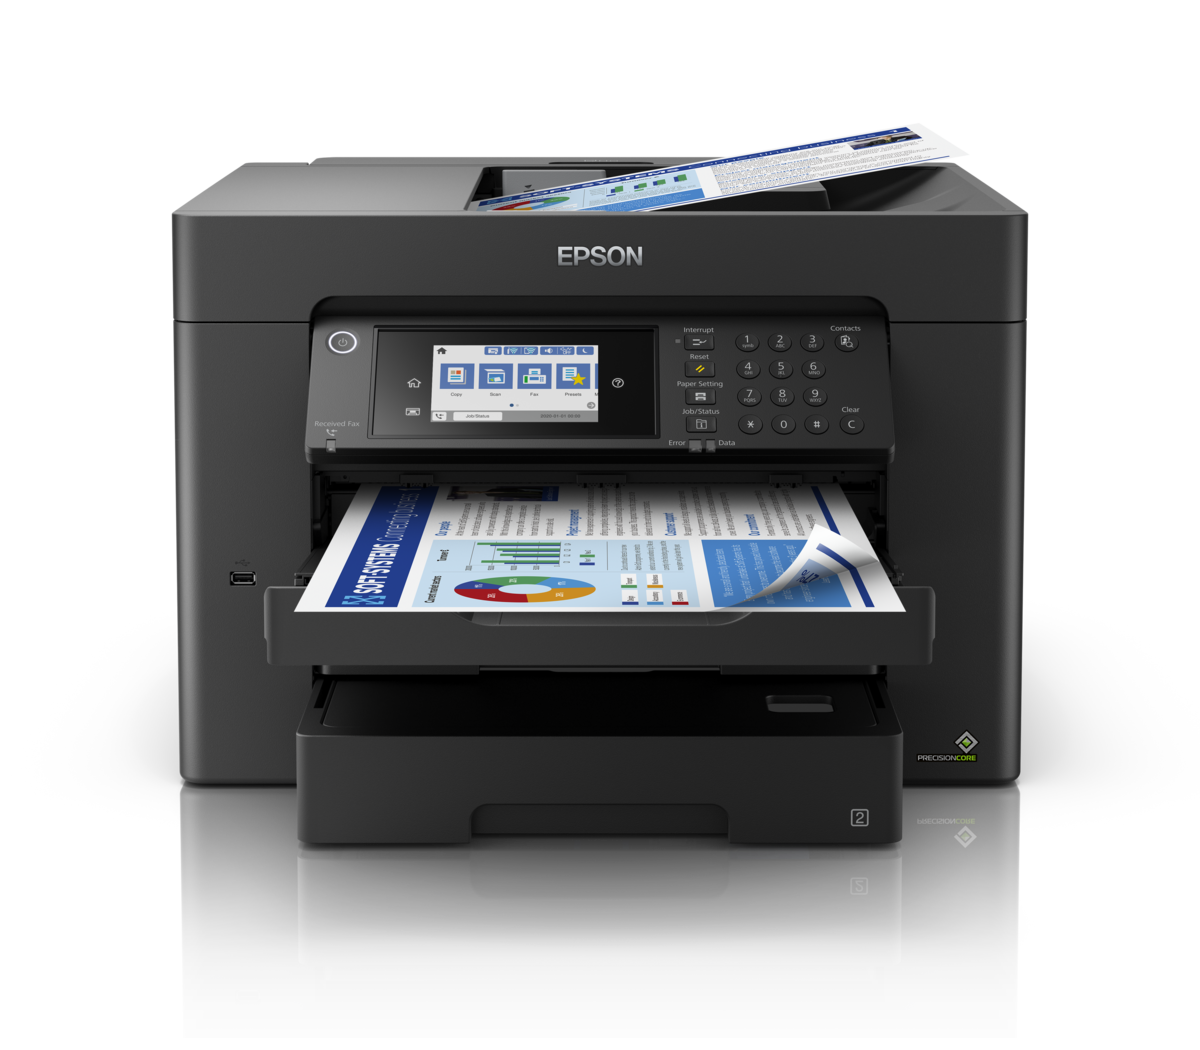 Epson WorkForce WF-7841 A3 Multifunction Printer